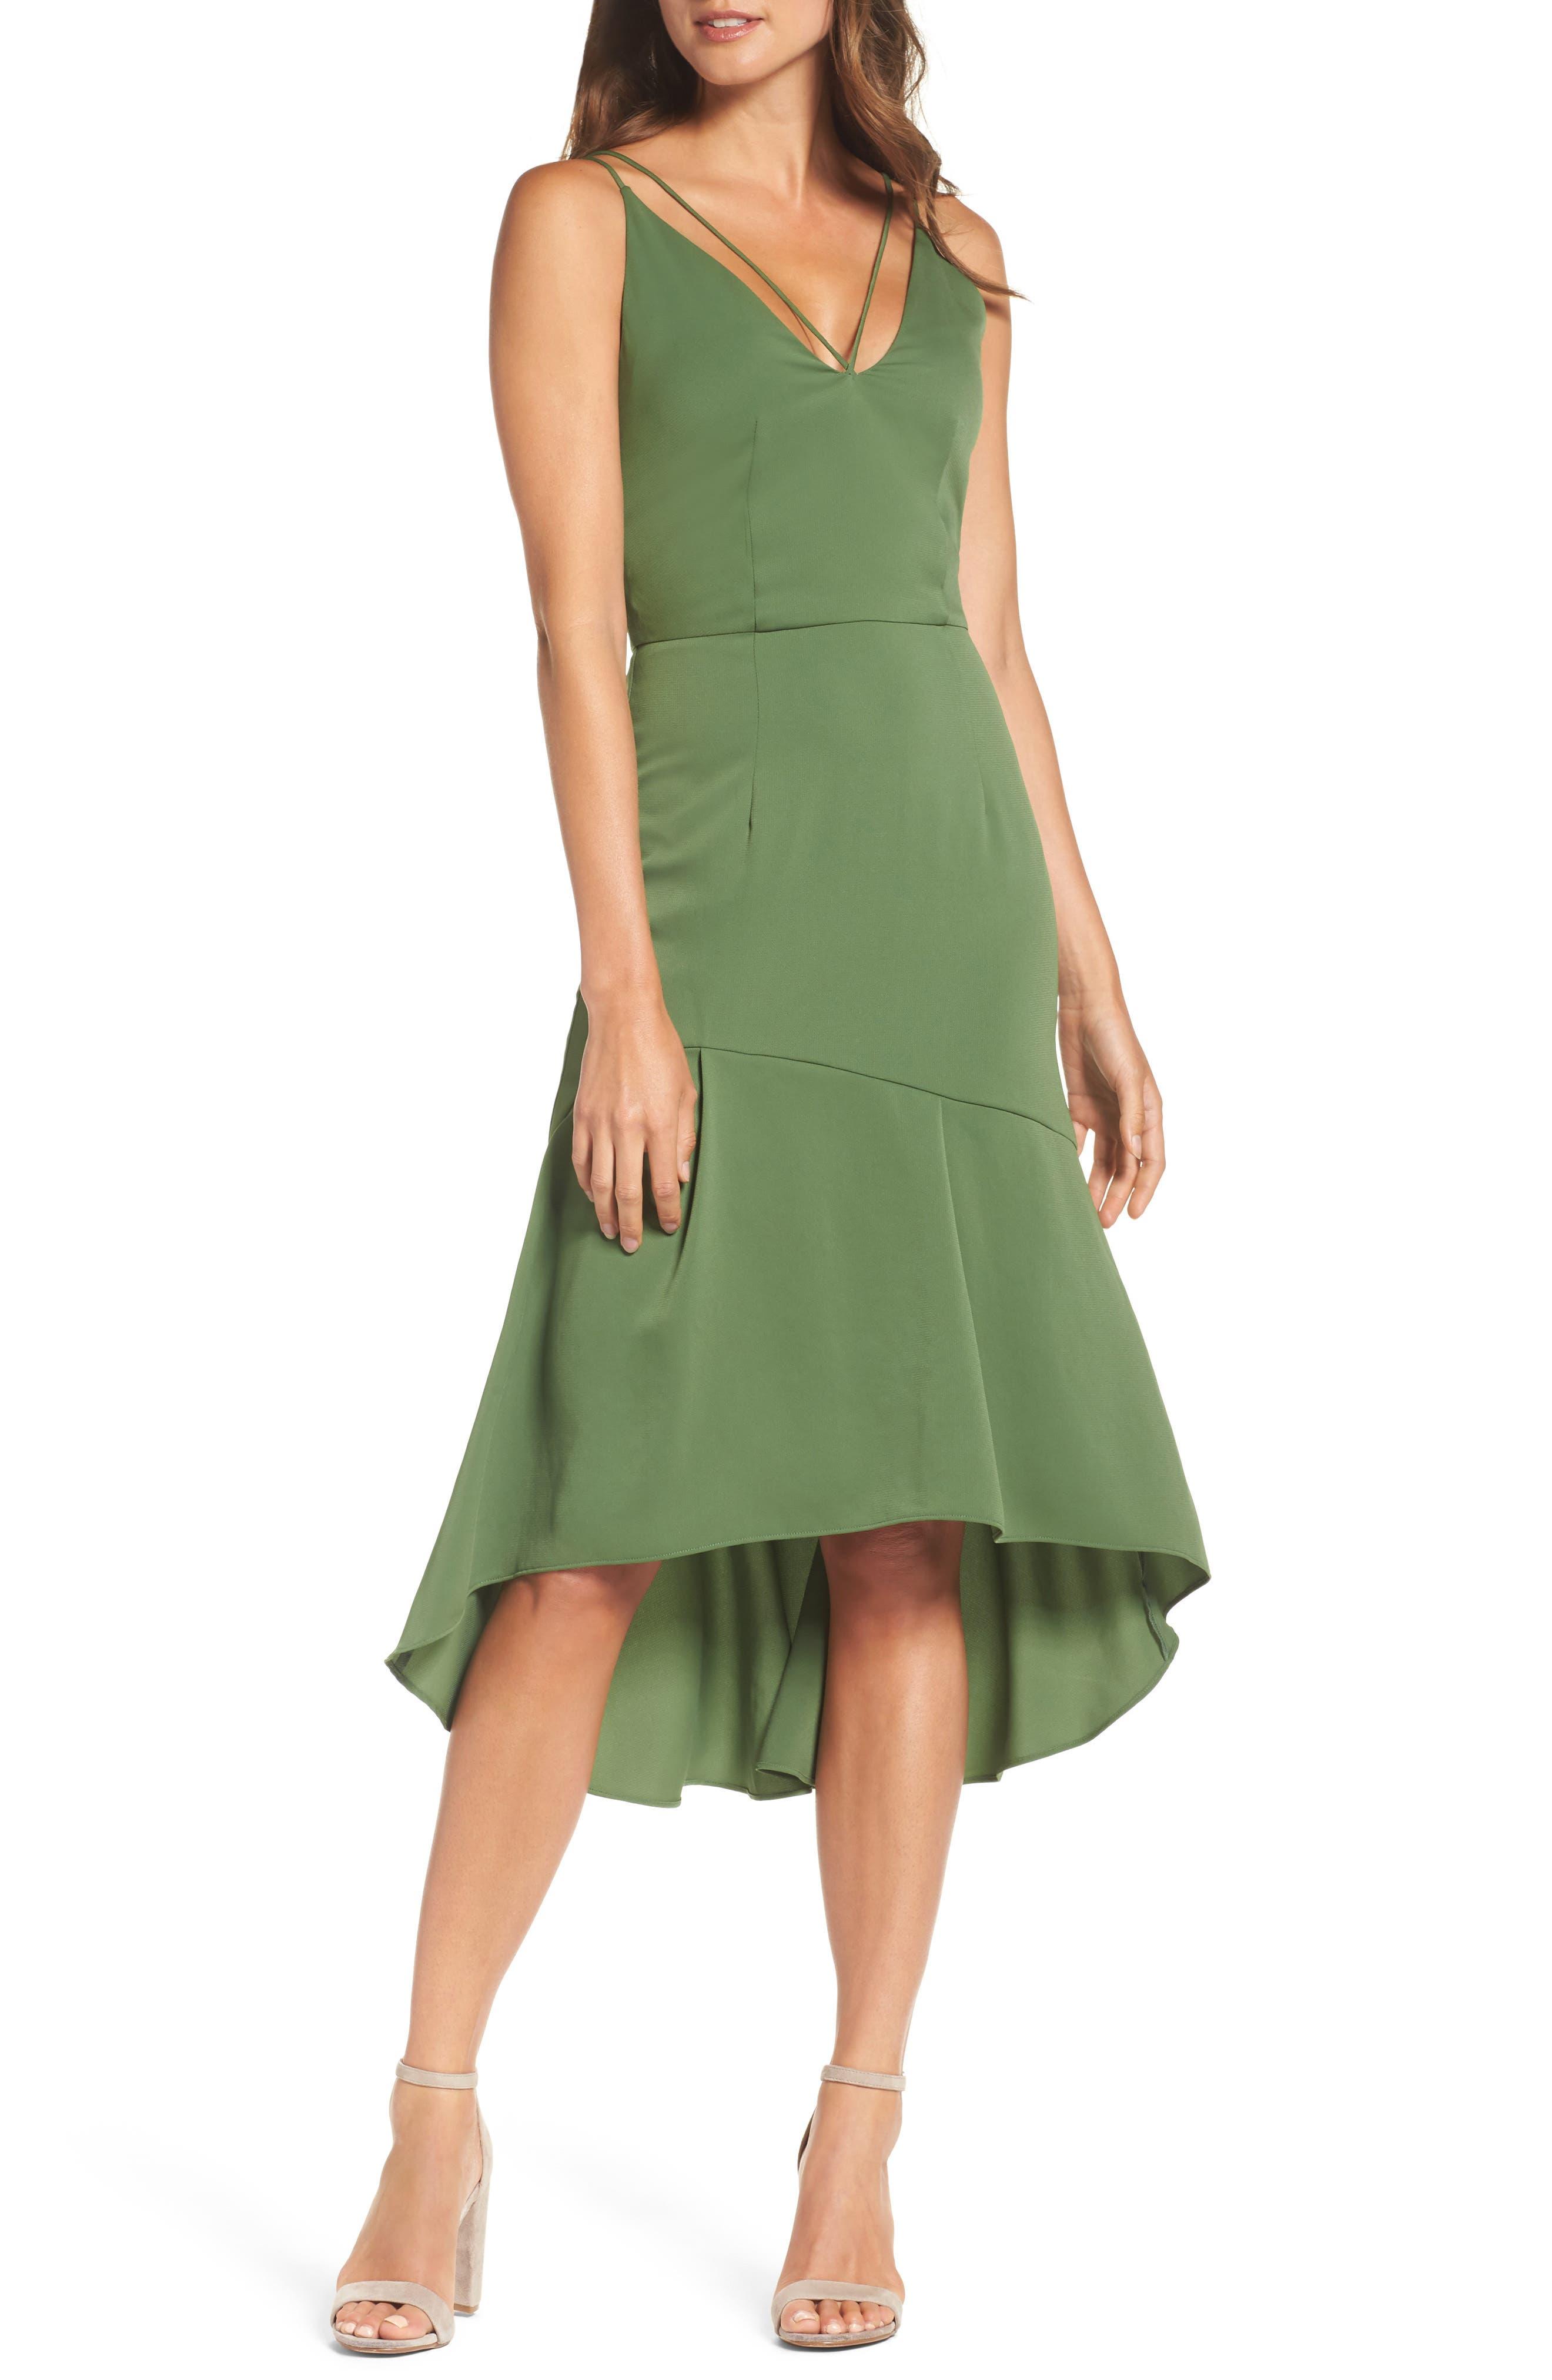 Lovine Midi Dress,                             Main thumbnail 1, color,                             Moss Green